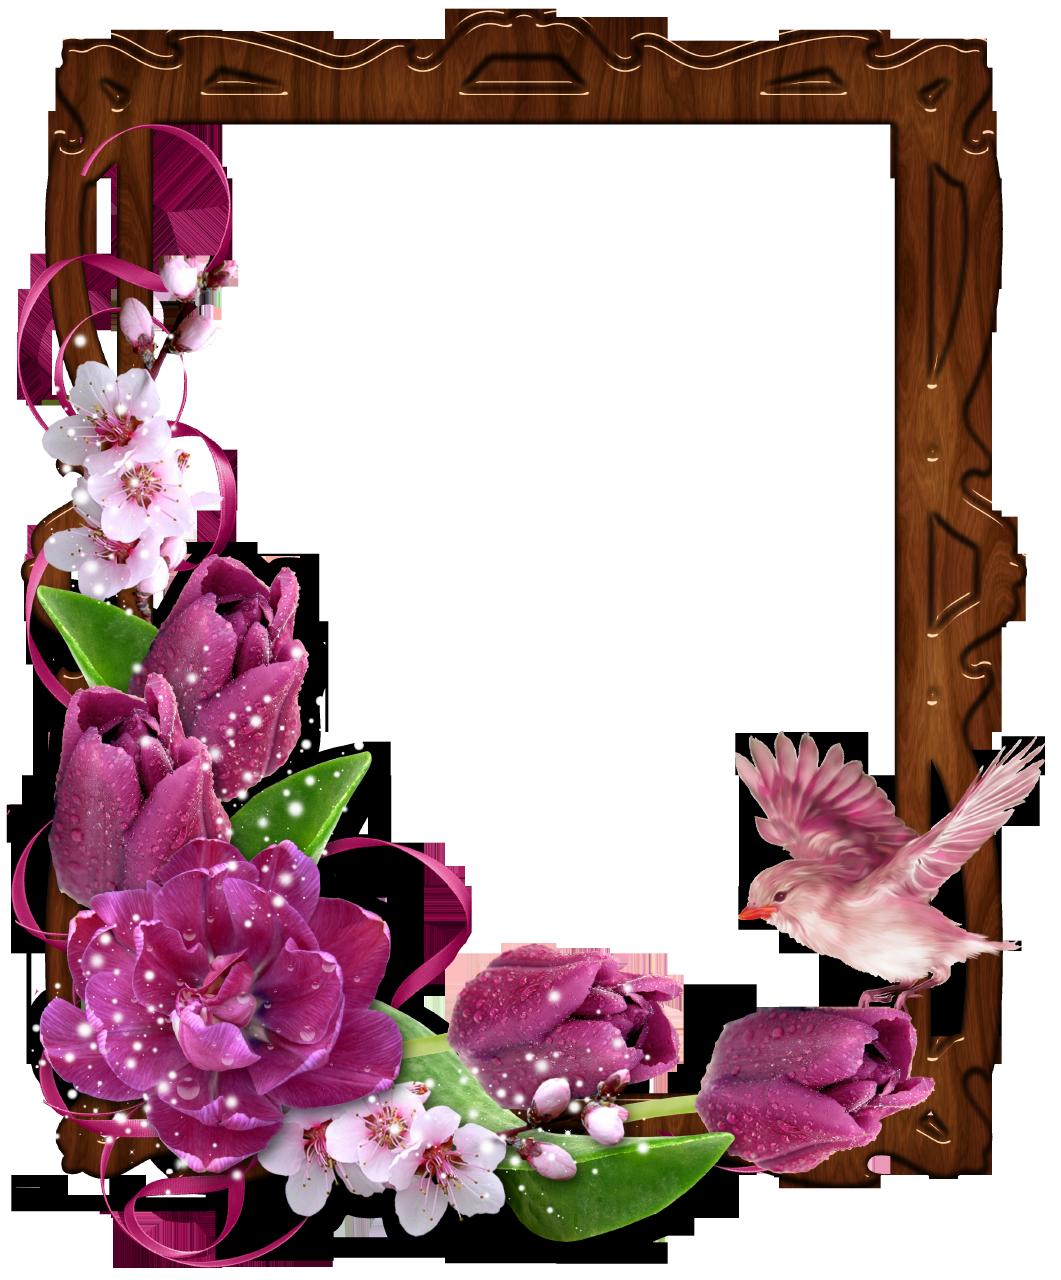 Frames clipart bird. Floral border wooden photo